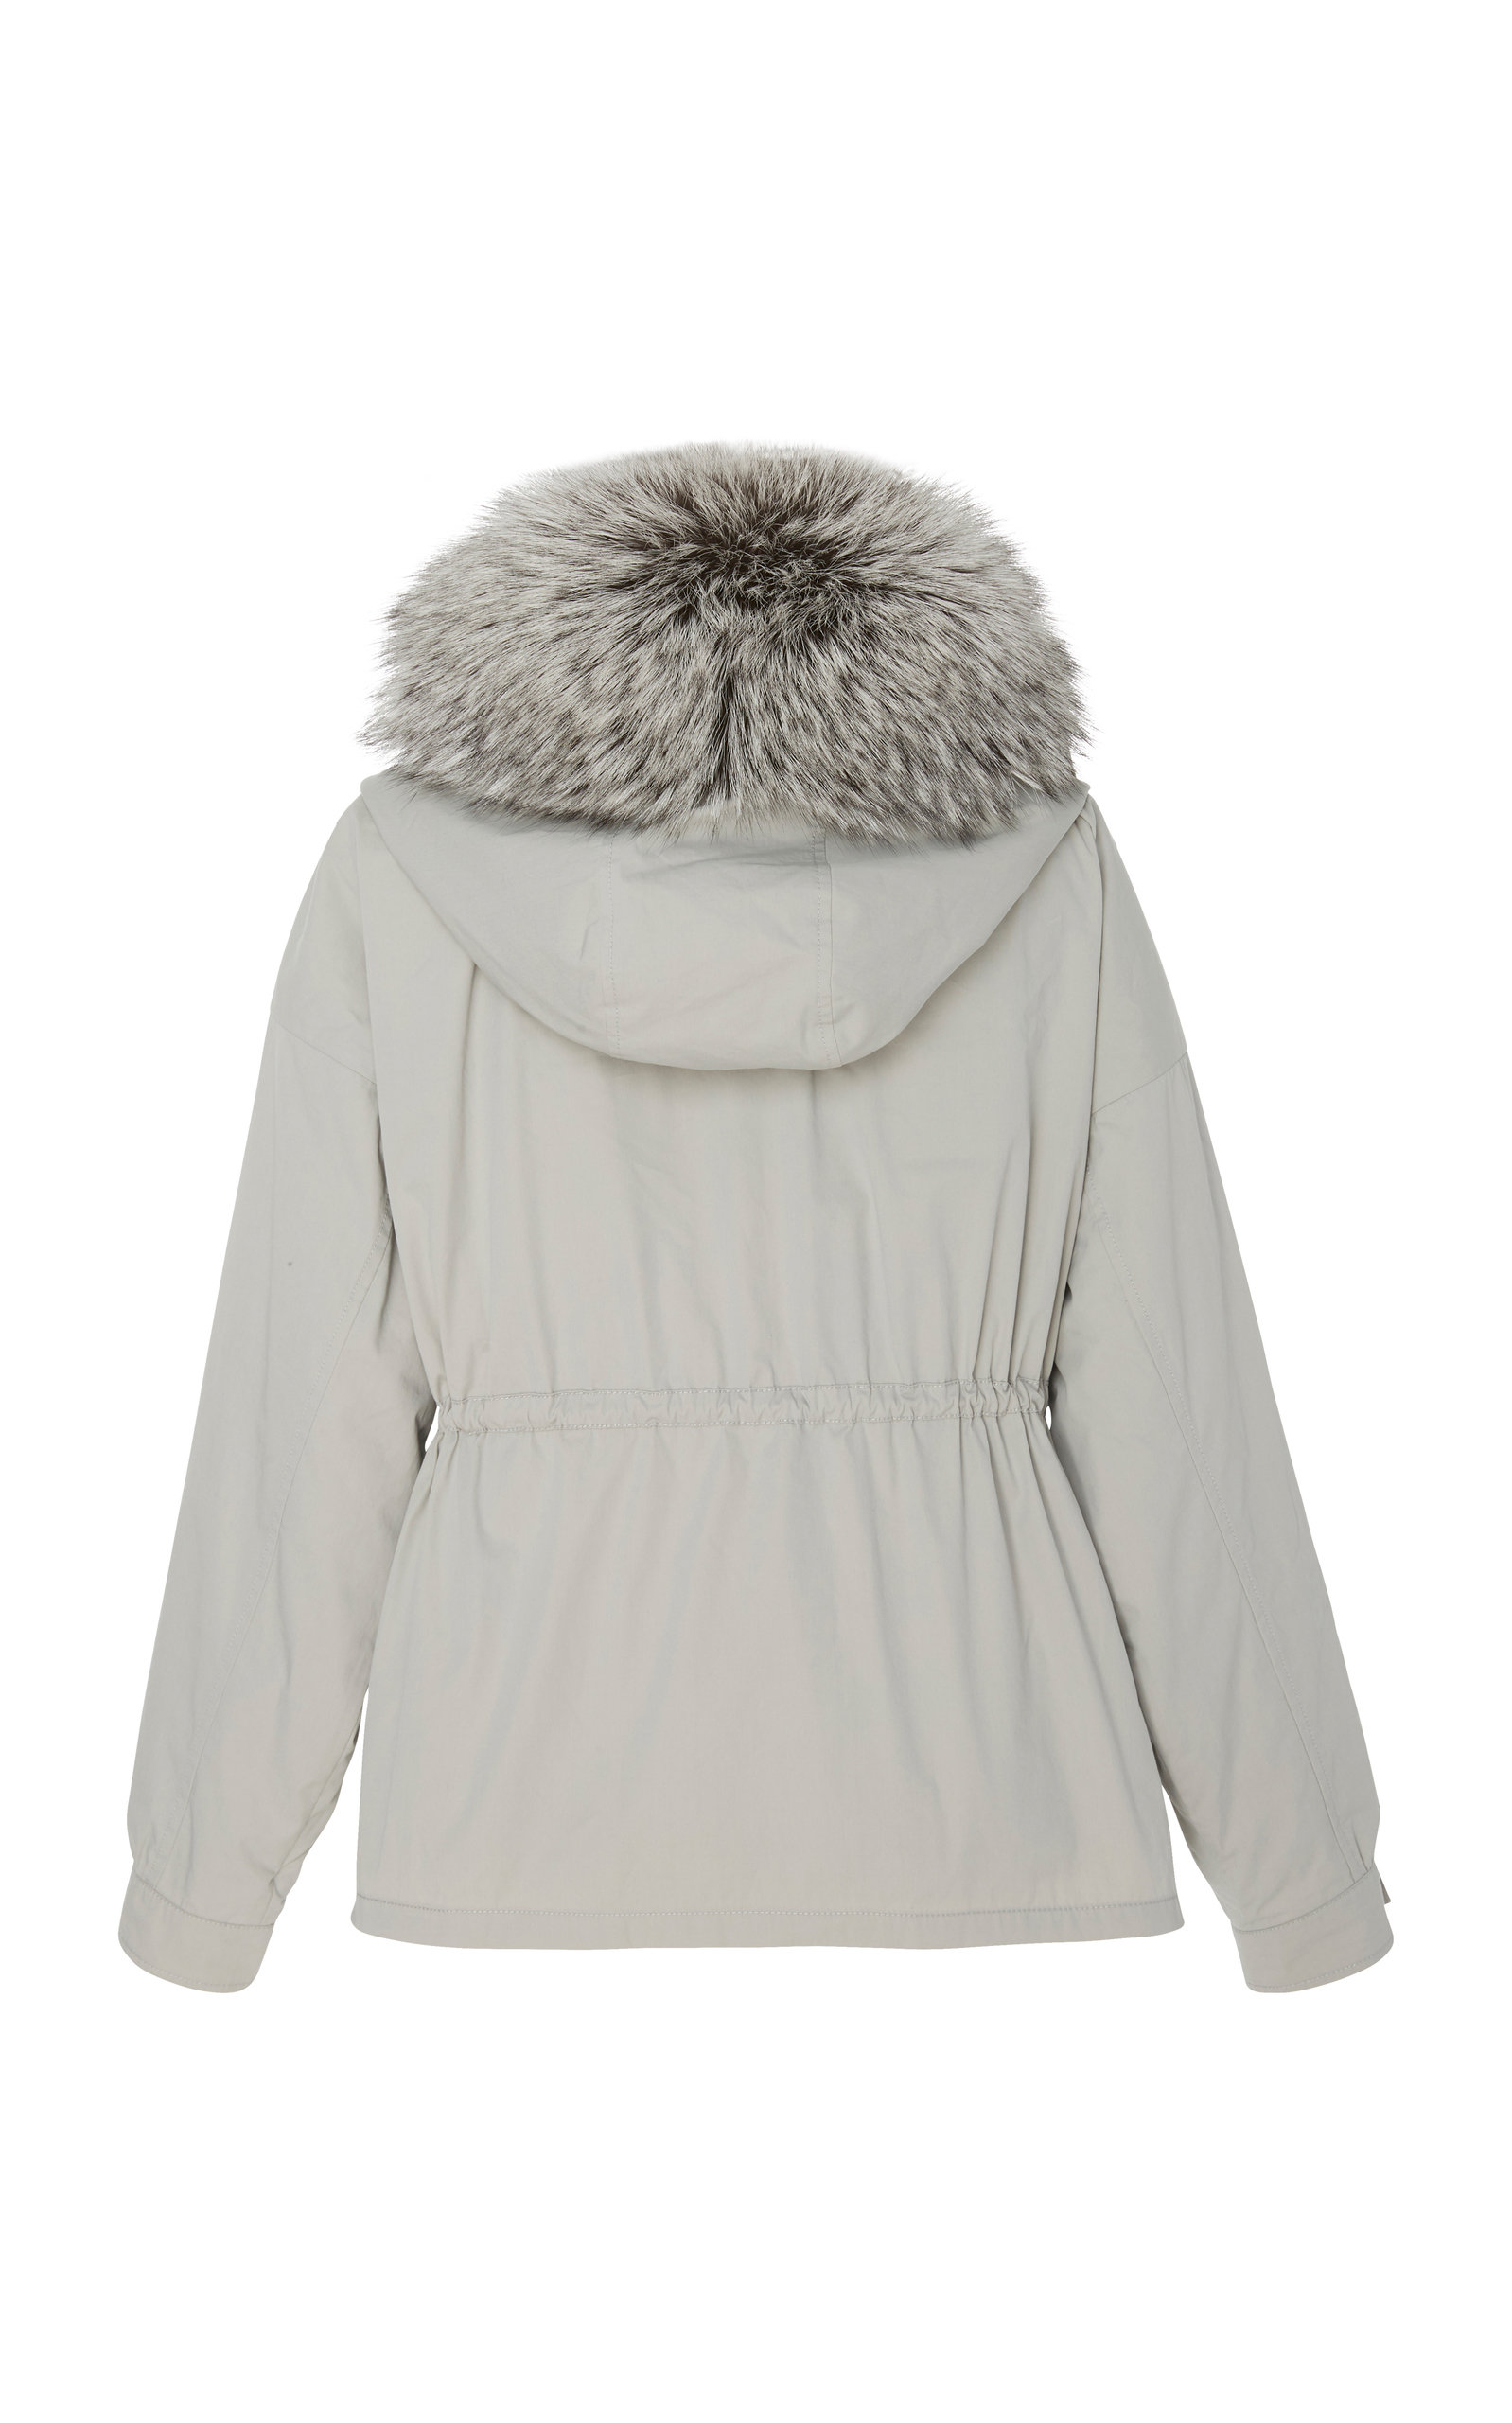 7b2f3c1edaef Fox Fur-Trimmed Cotton-Bachette Parka by Yves Salomon Paris